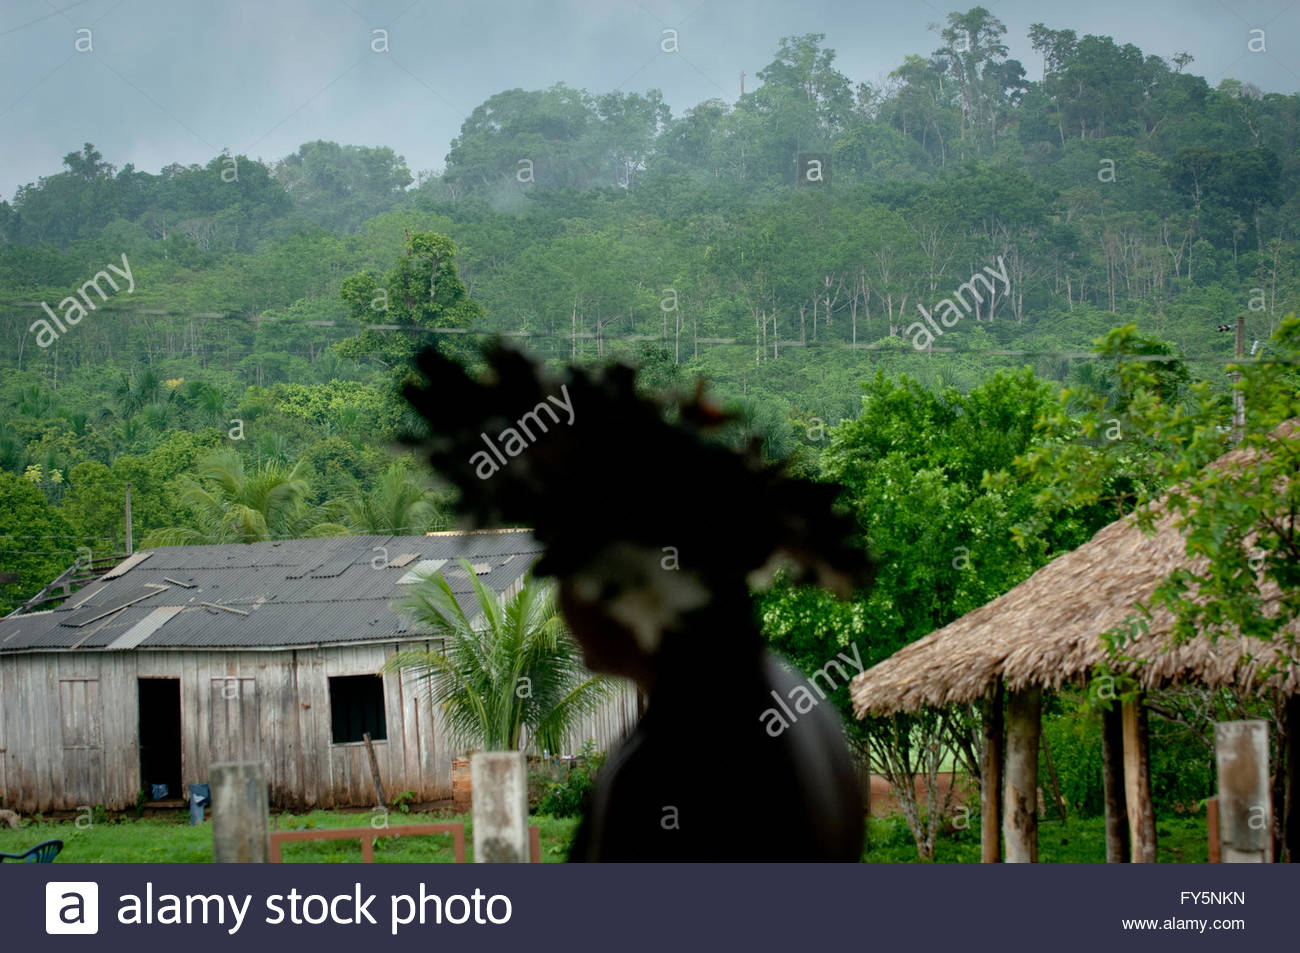 Lapetanha, Rondonia, Brazil at the '7th September Indian Reserve',Rondonia, Brazil. - Stock Image